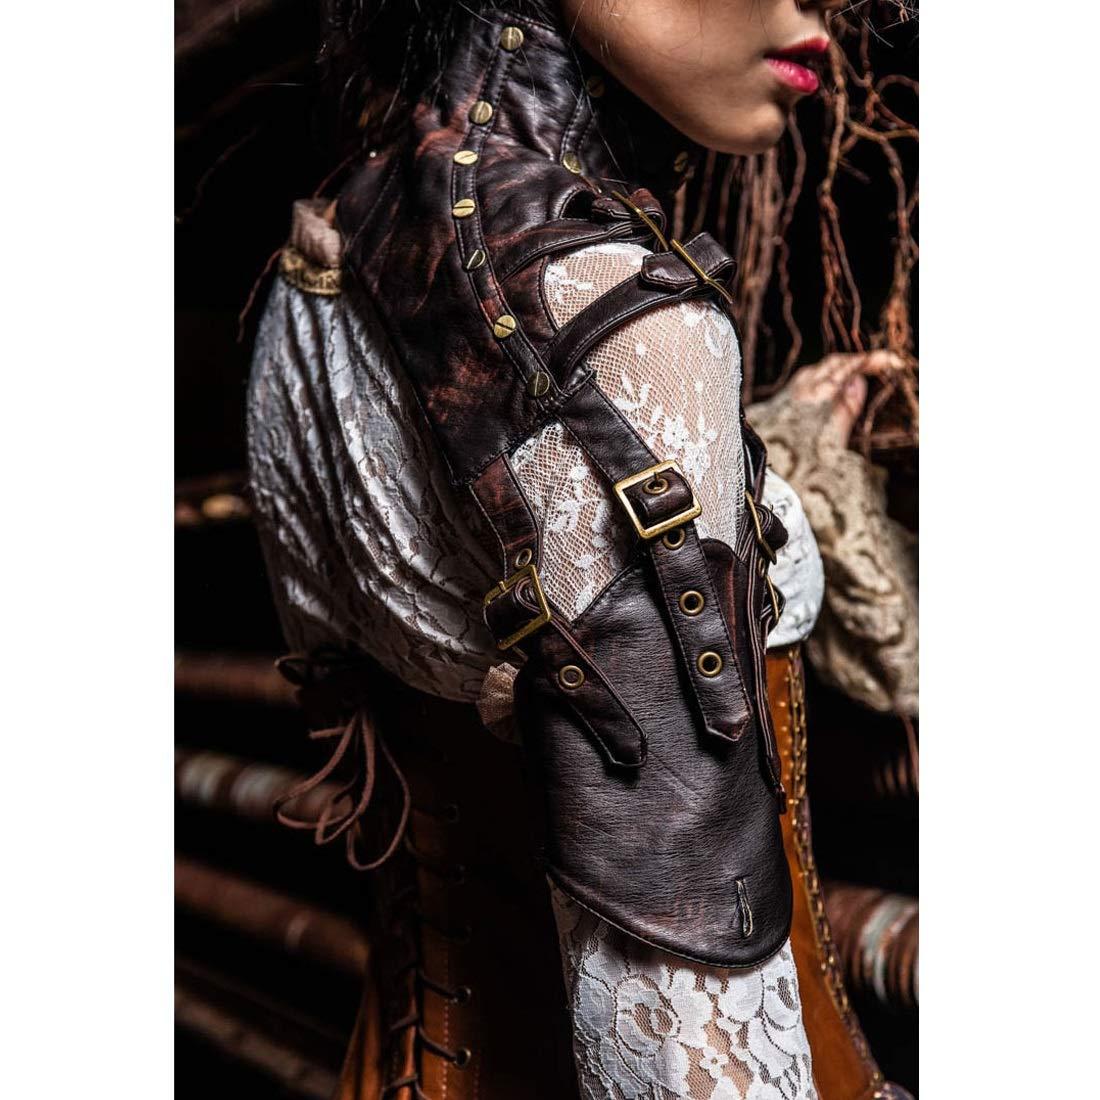 Hungrybubble Steampunk - Chaqueta de corseacute; corseacute; corseacute; con Hebillas de Hombro y armazoacute;n, marroacute;n, Small 4ee850